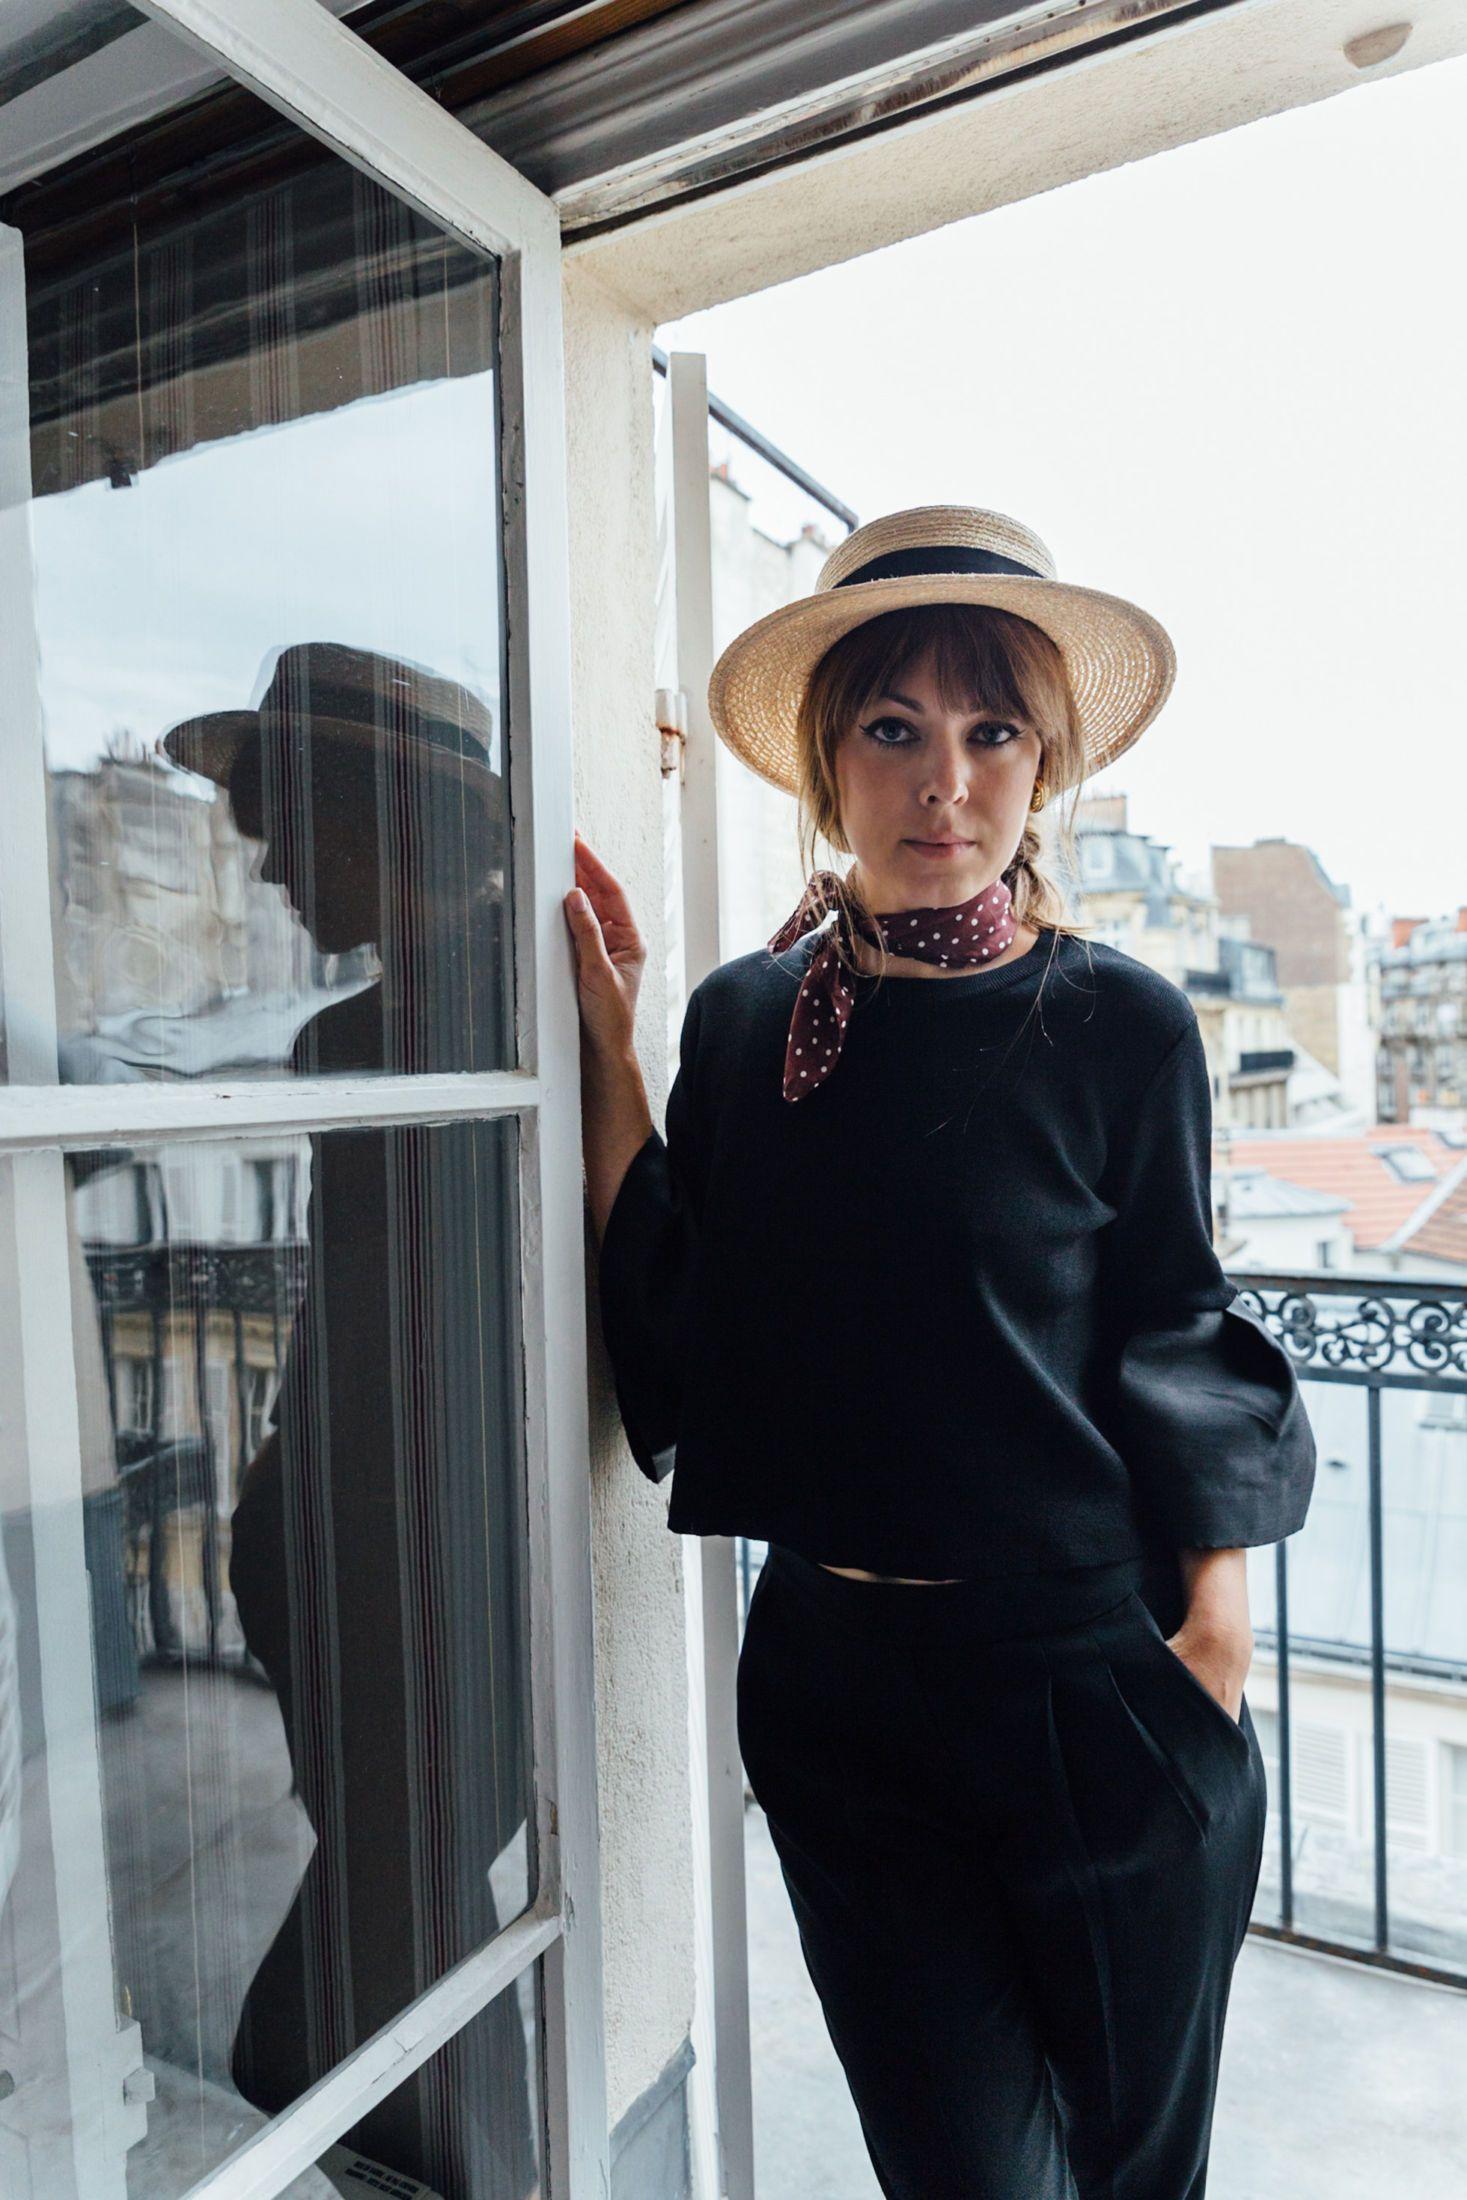 Trove Blogger App Instagram Shopping Fashion Margo Me Fashion Jenny Cipoletti Apps For Bloggers